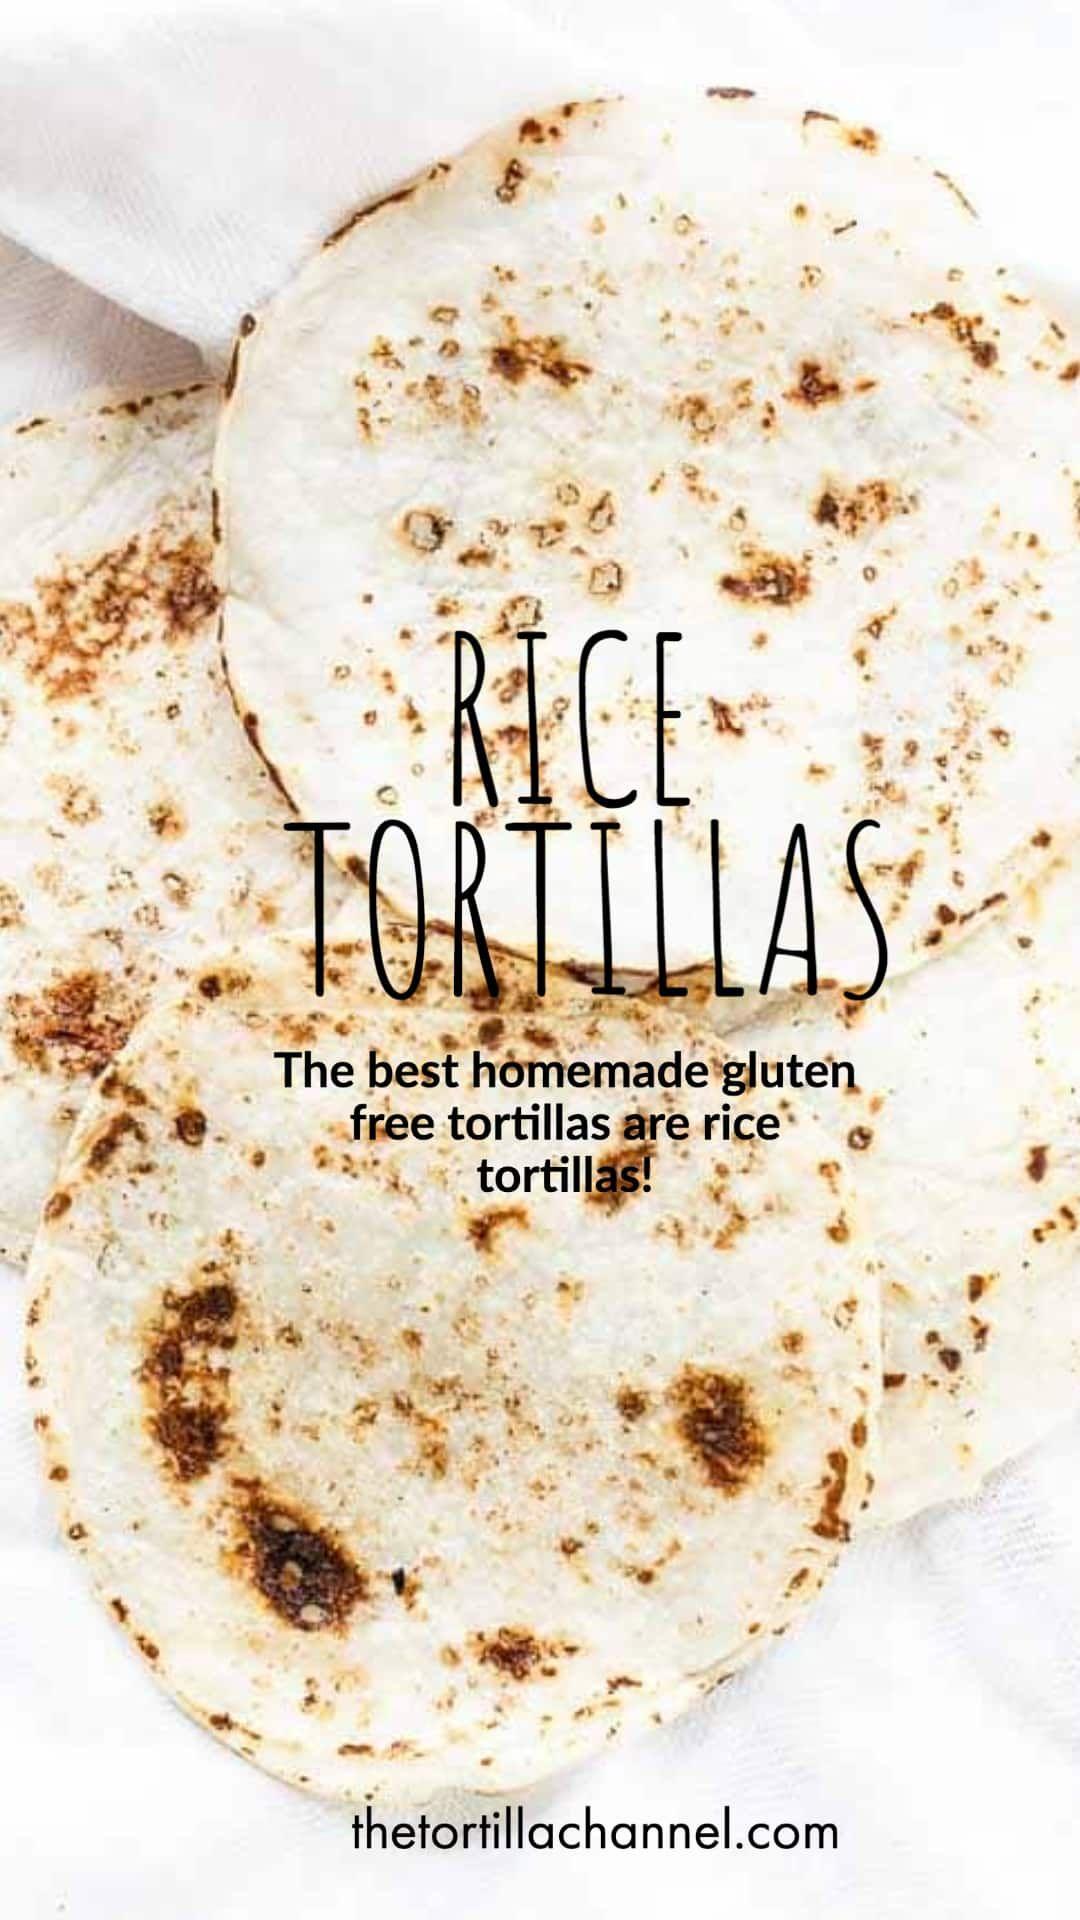 Rice Flour Tortillas Recipe in 2020 Homemade gluten